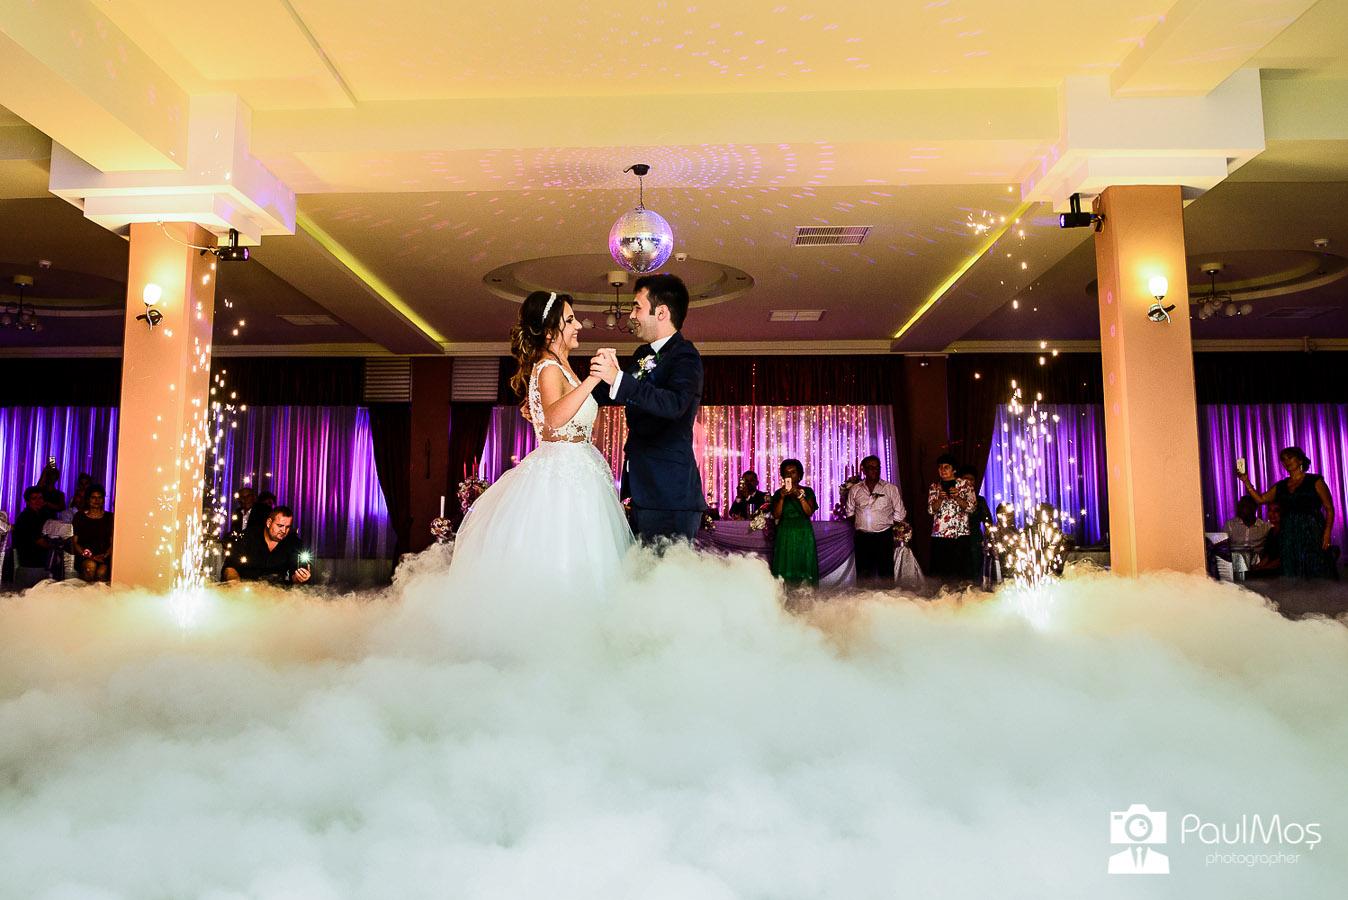 Fotograf evenimente Reșita, fotograf profesionist, nunta, evenimente resita,